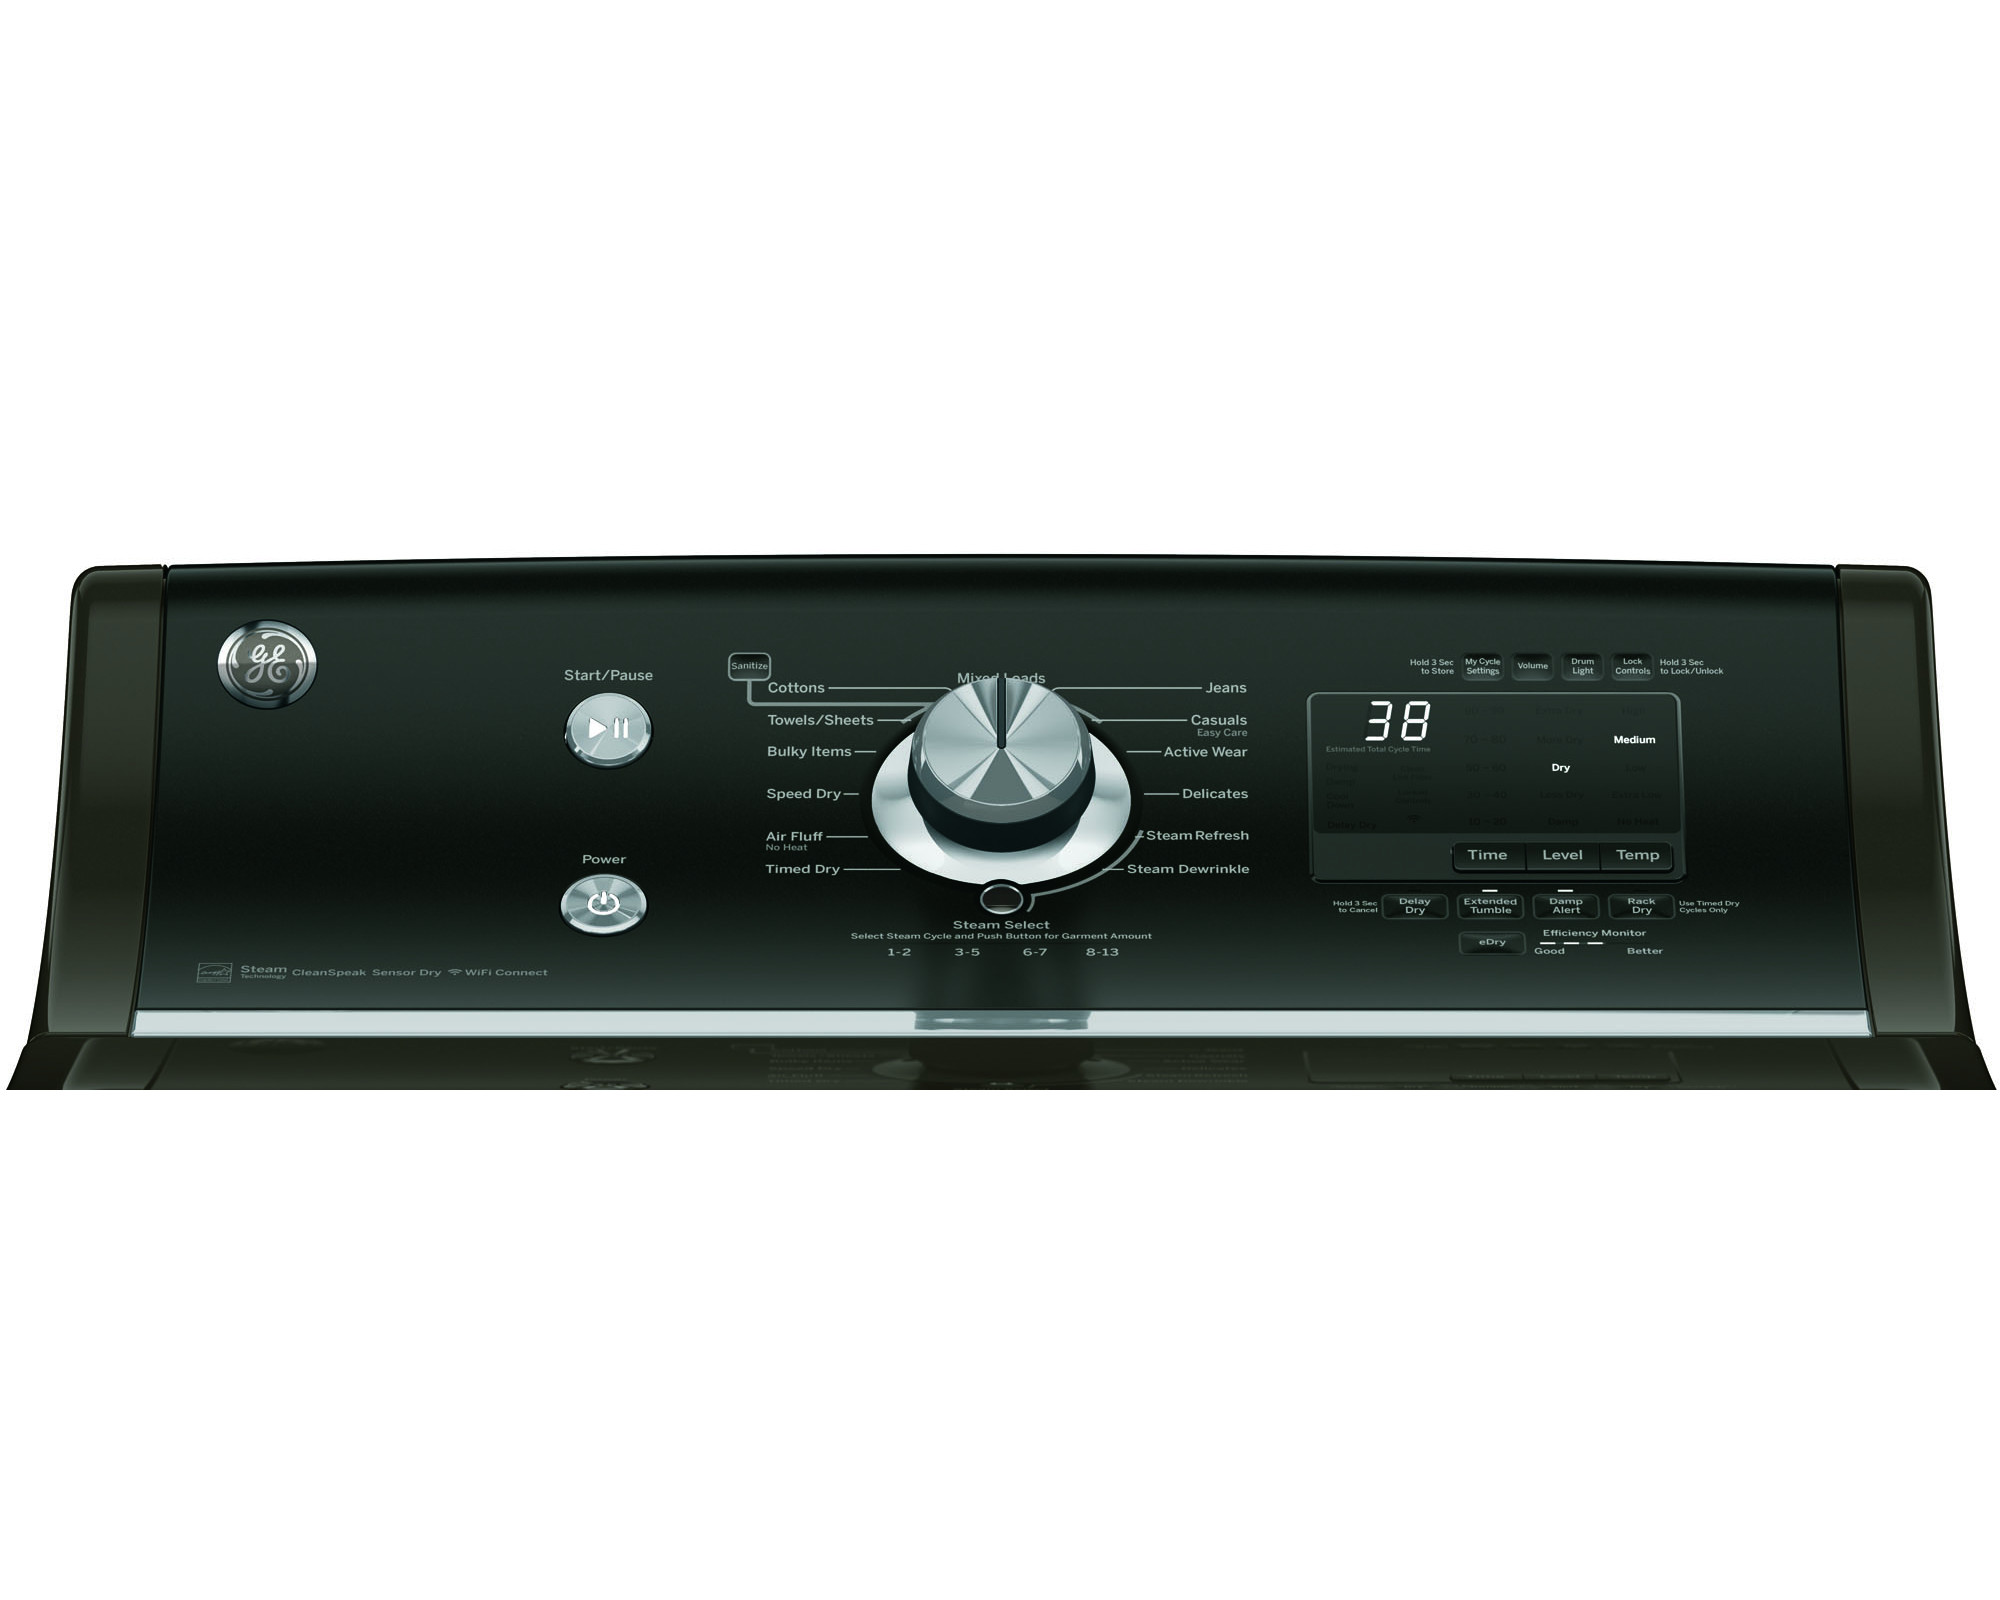 GE Appliances GTD86ESPJMC 7.8 cu. ft. Electric Dryer - Metallic